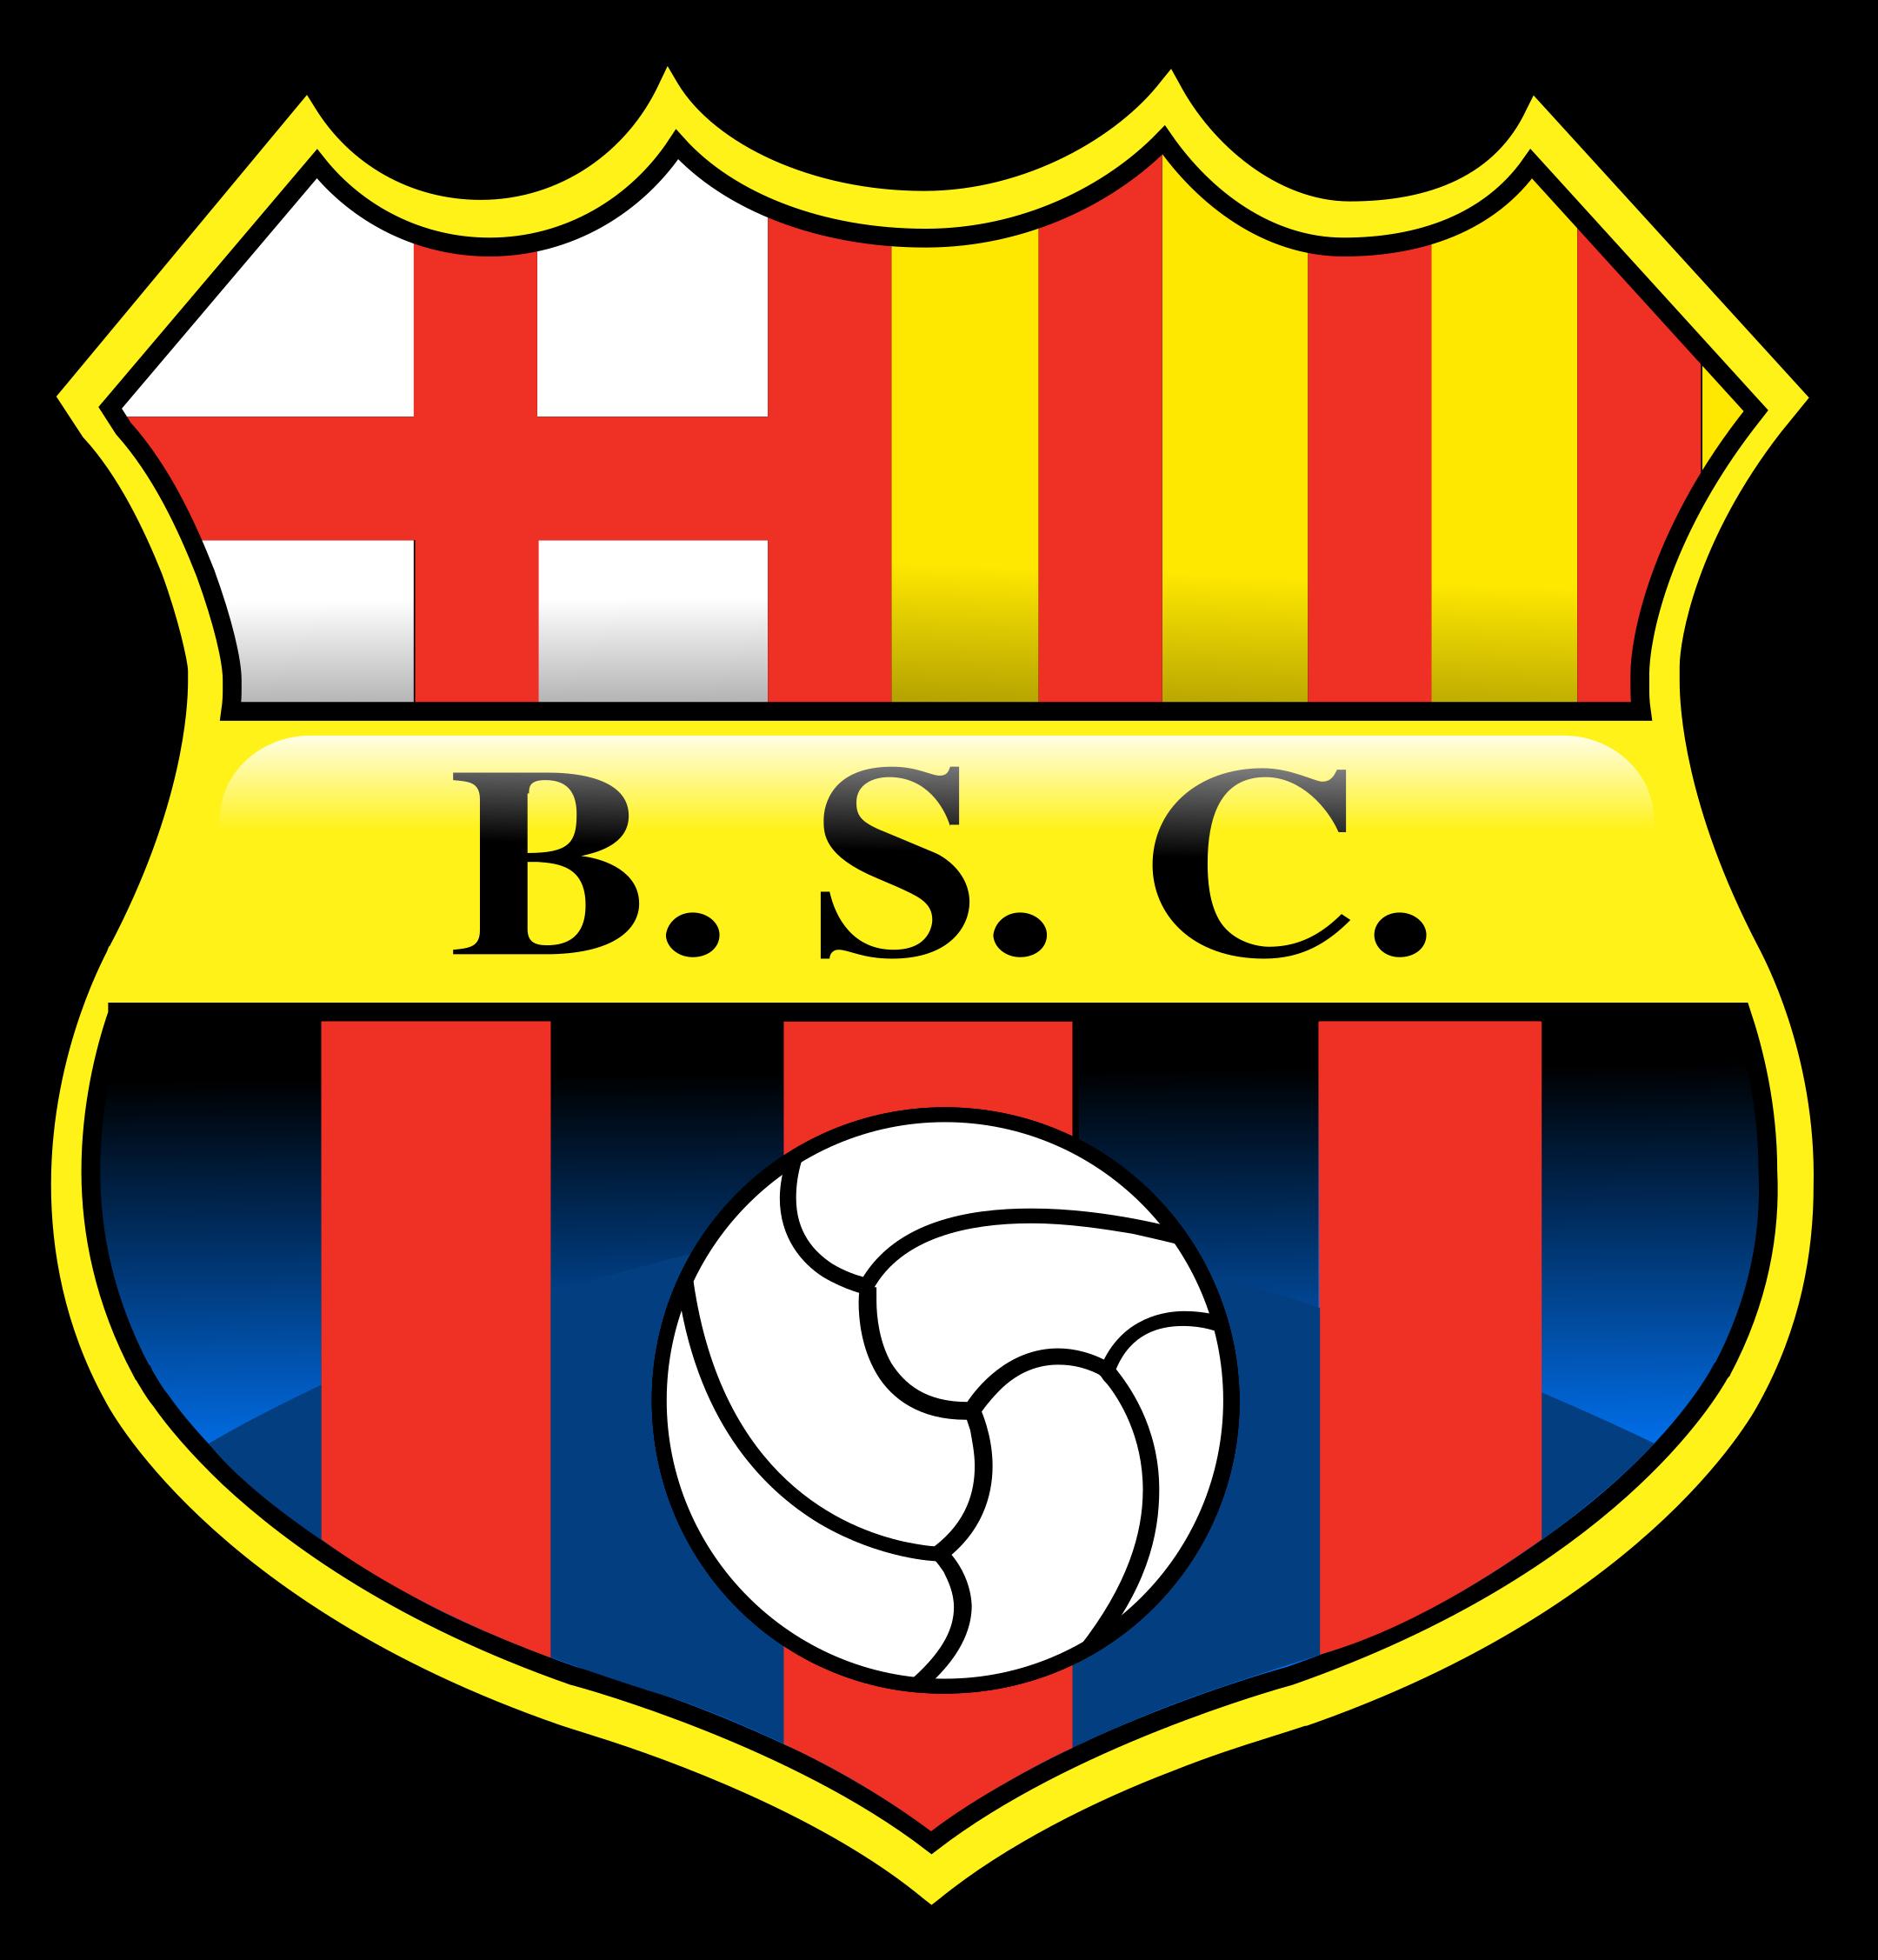 barcelona guayaquil logo 1 - Barcelona SC Guayaquil Logo